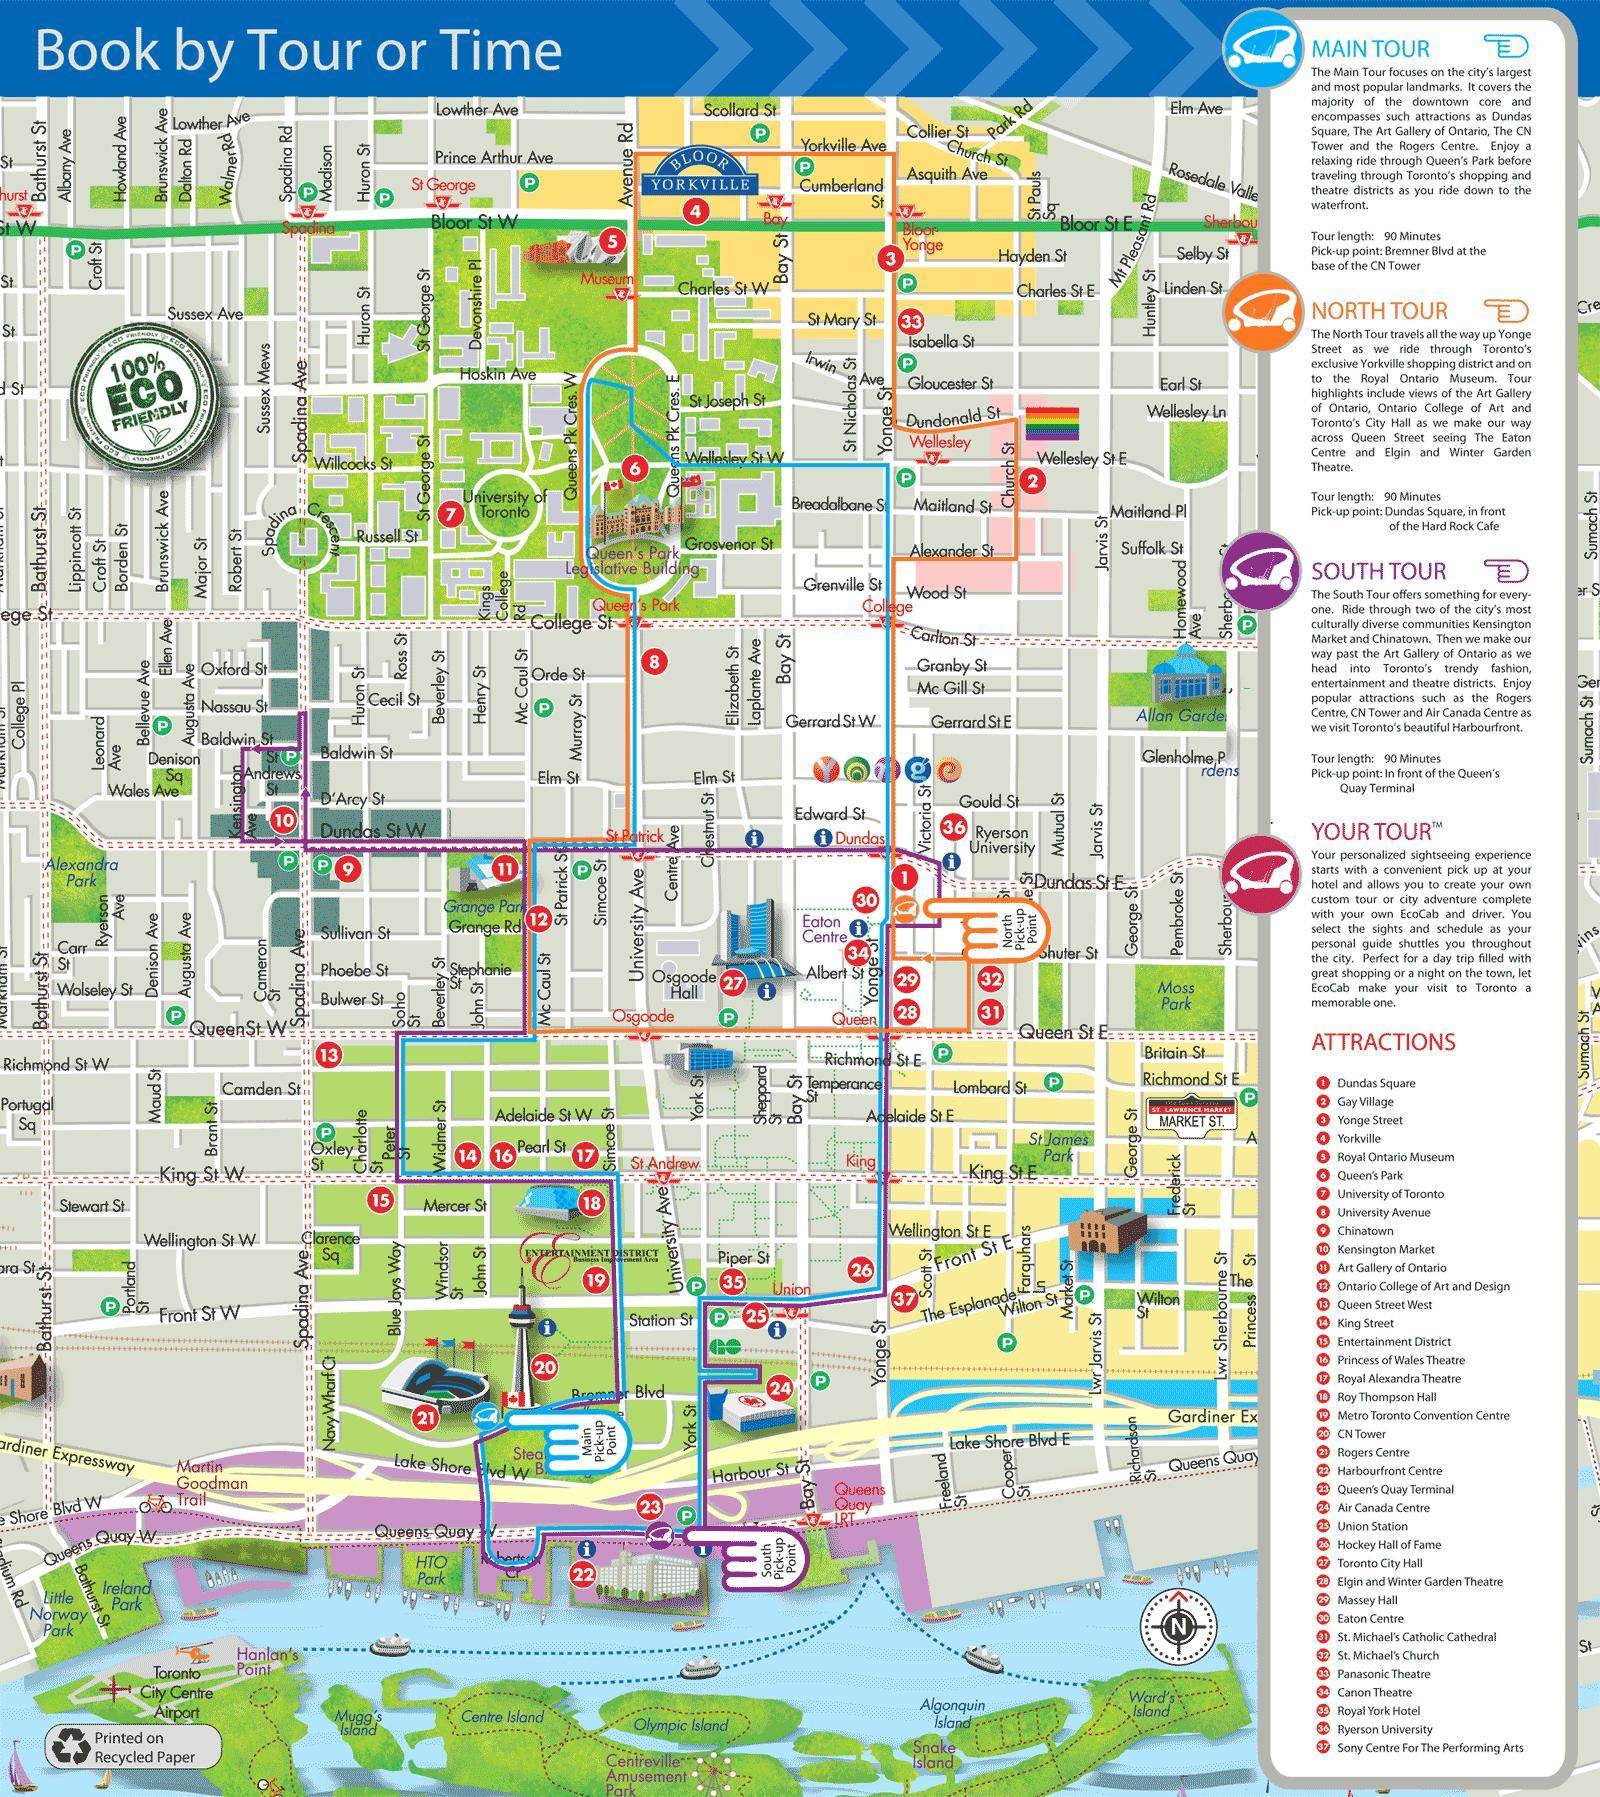 Karta Pa Kanada.Eco Cab Turer Toronto Karta Karta Over Eko Cab Turer Toronto Kanada